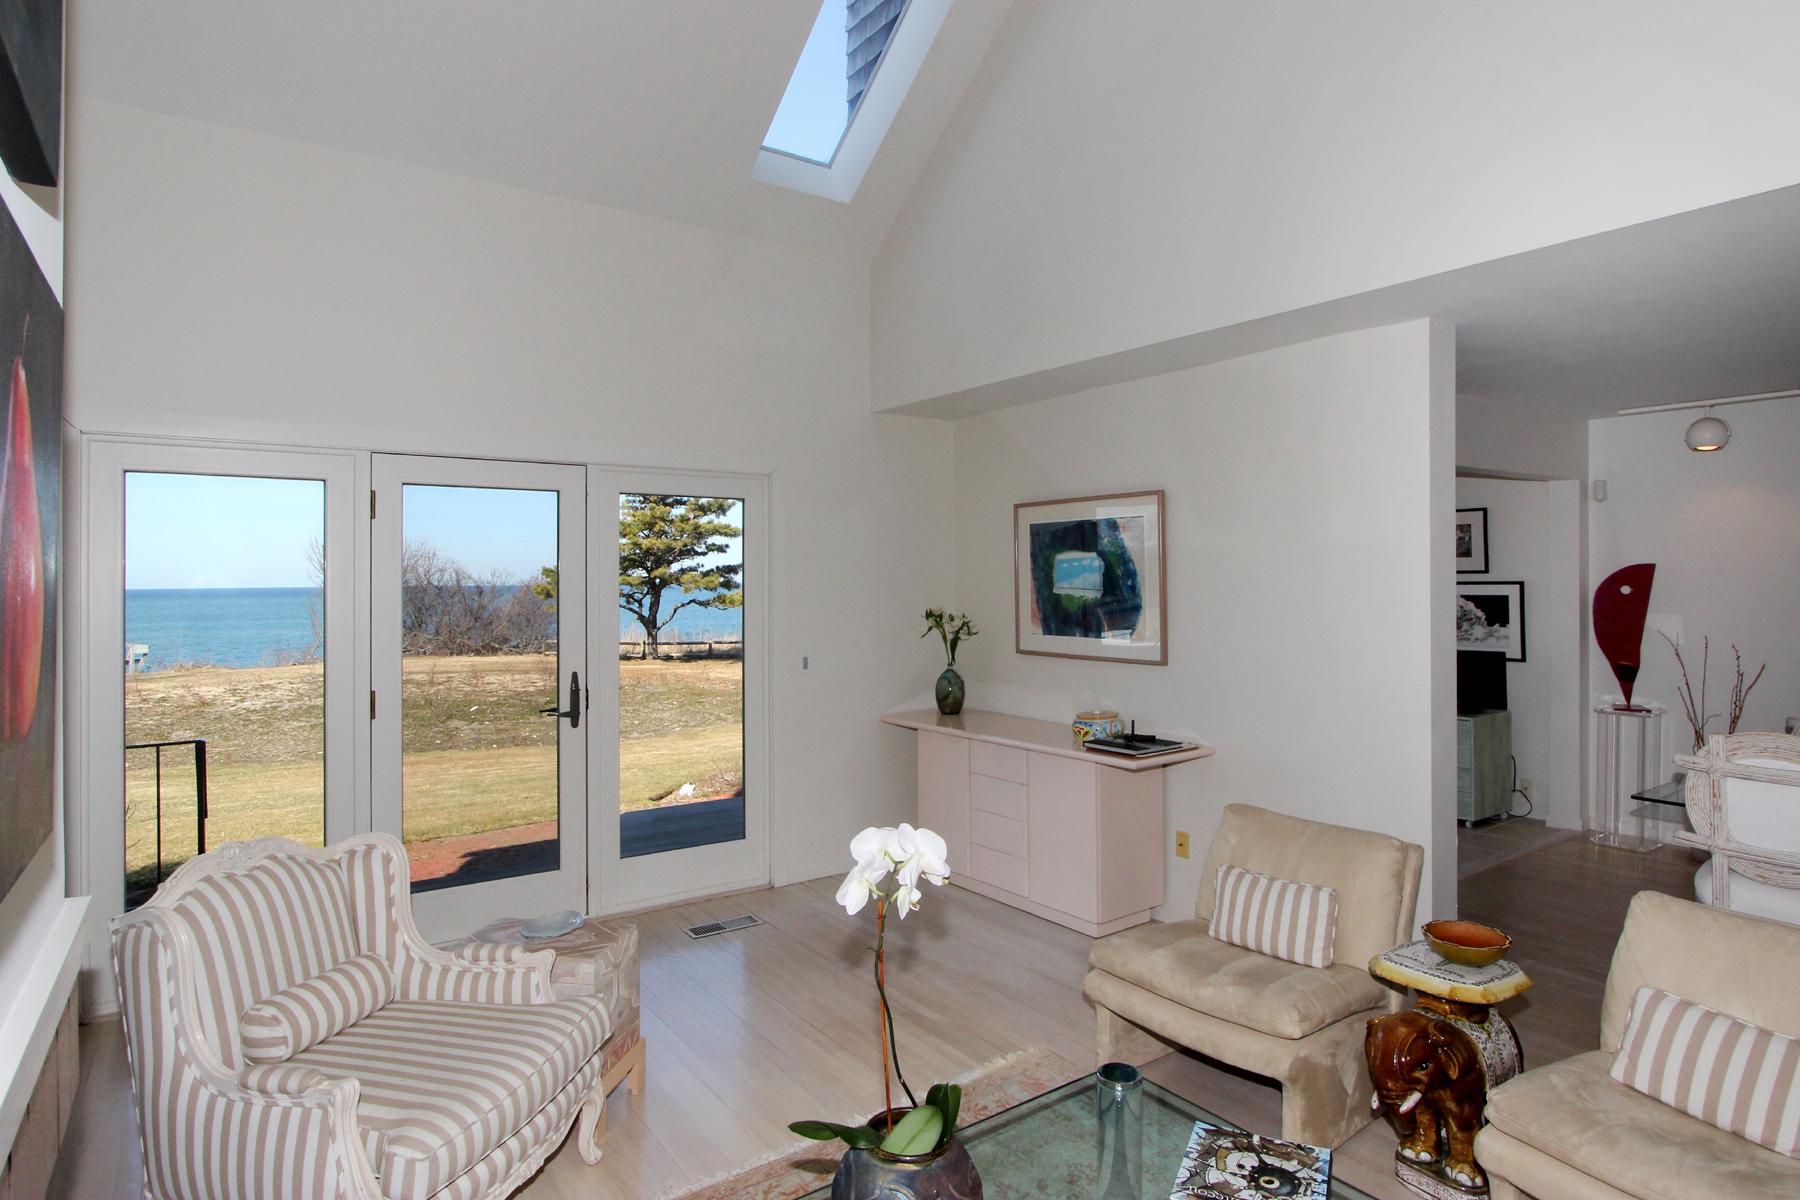 townhouses 为 销售 在 30 Wheeler Drive, Brewster, MA, 02631 30 Wheeler Drive 布鲁斯特, 马萨诸塞州 02631 美国